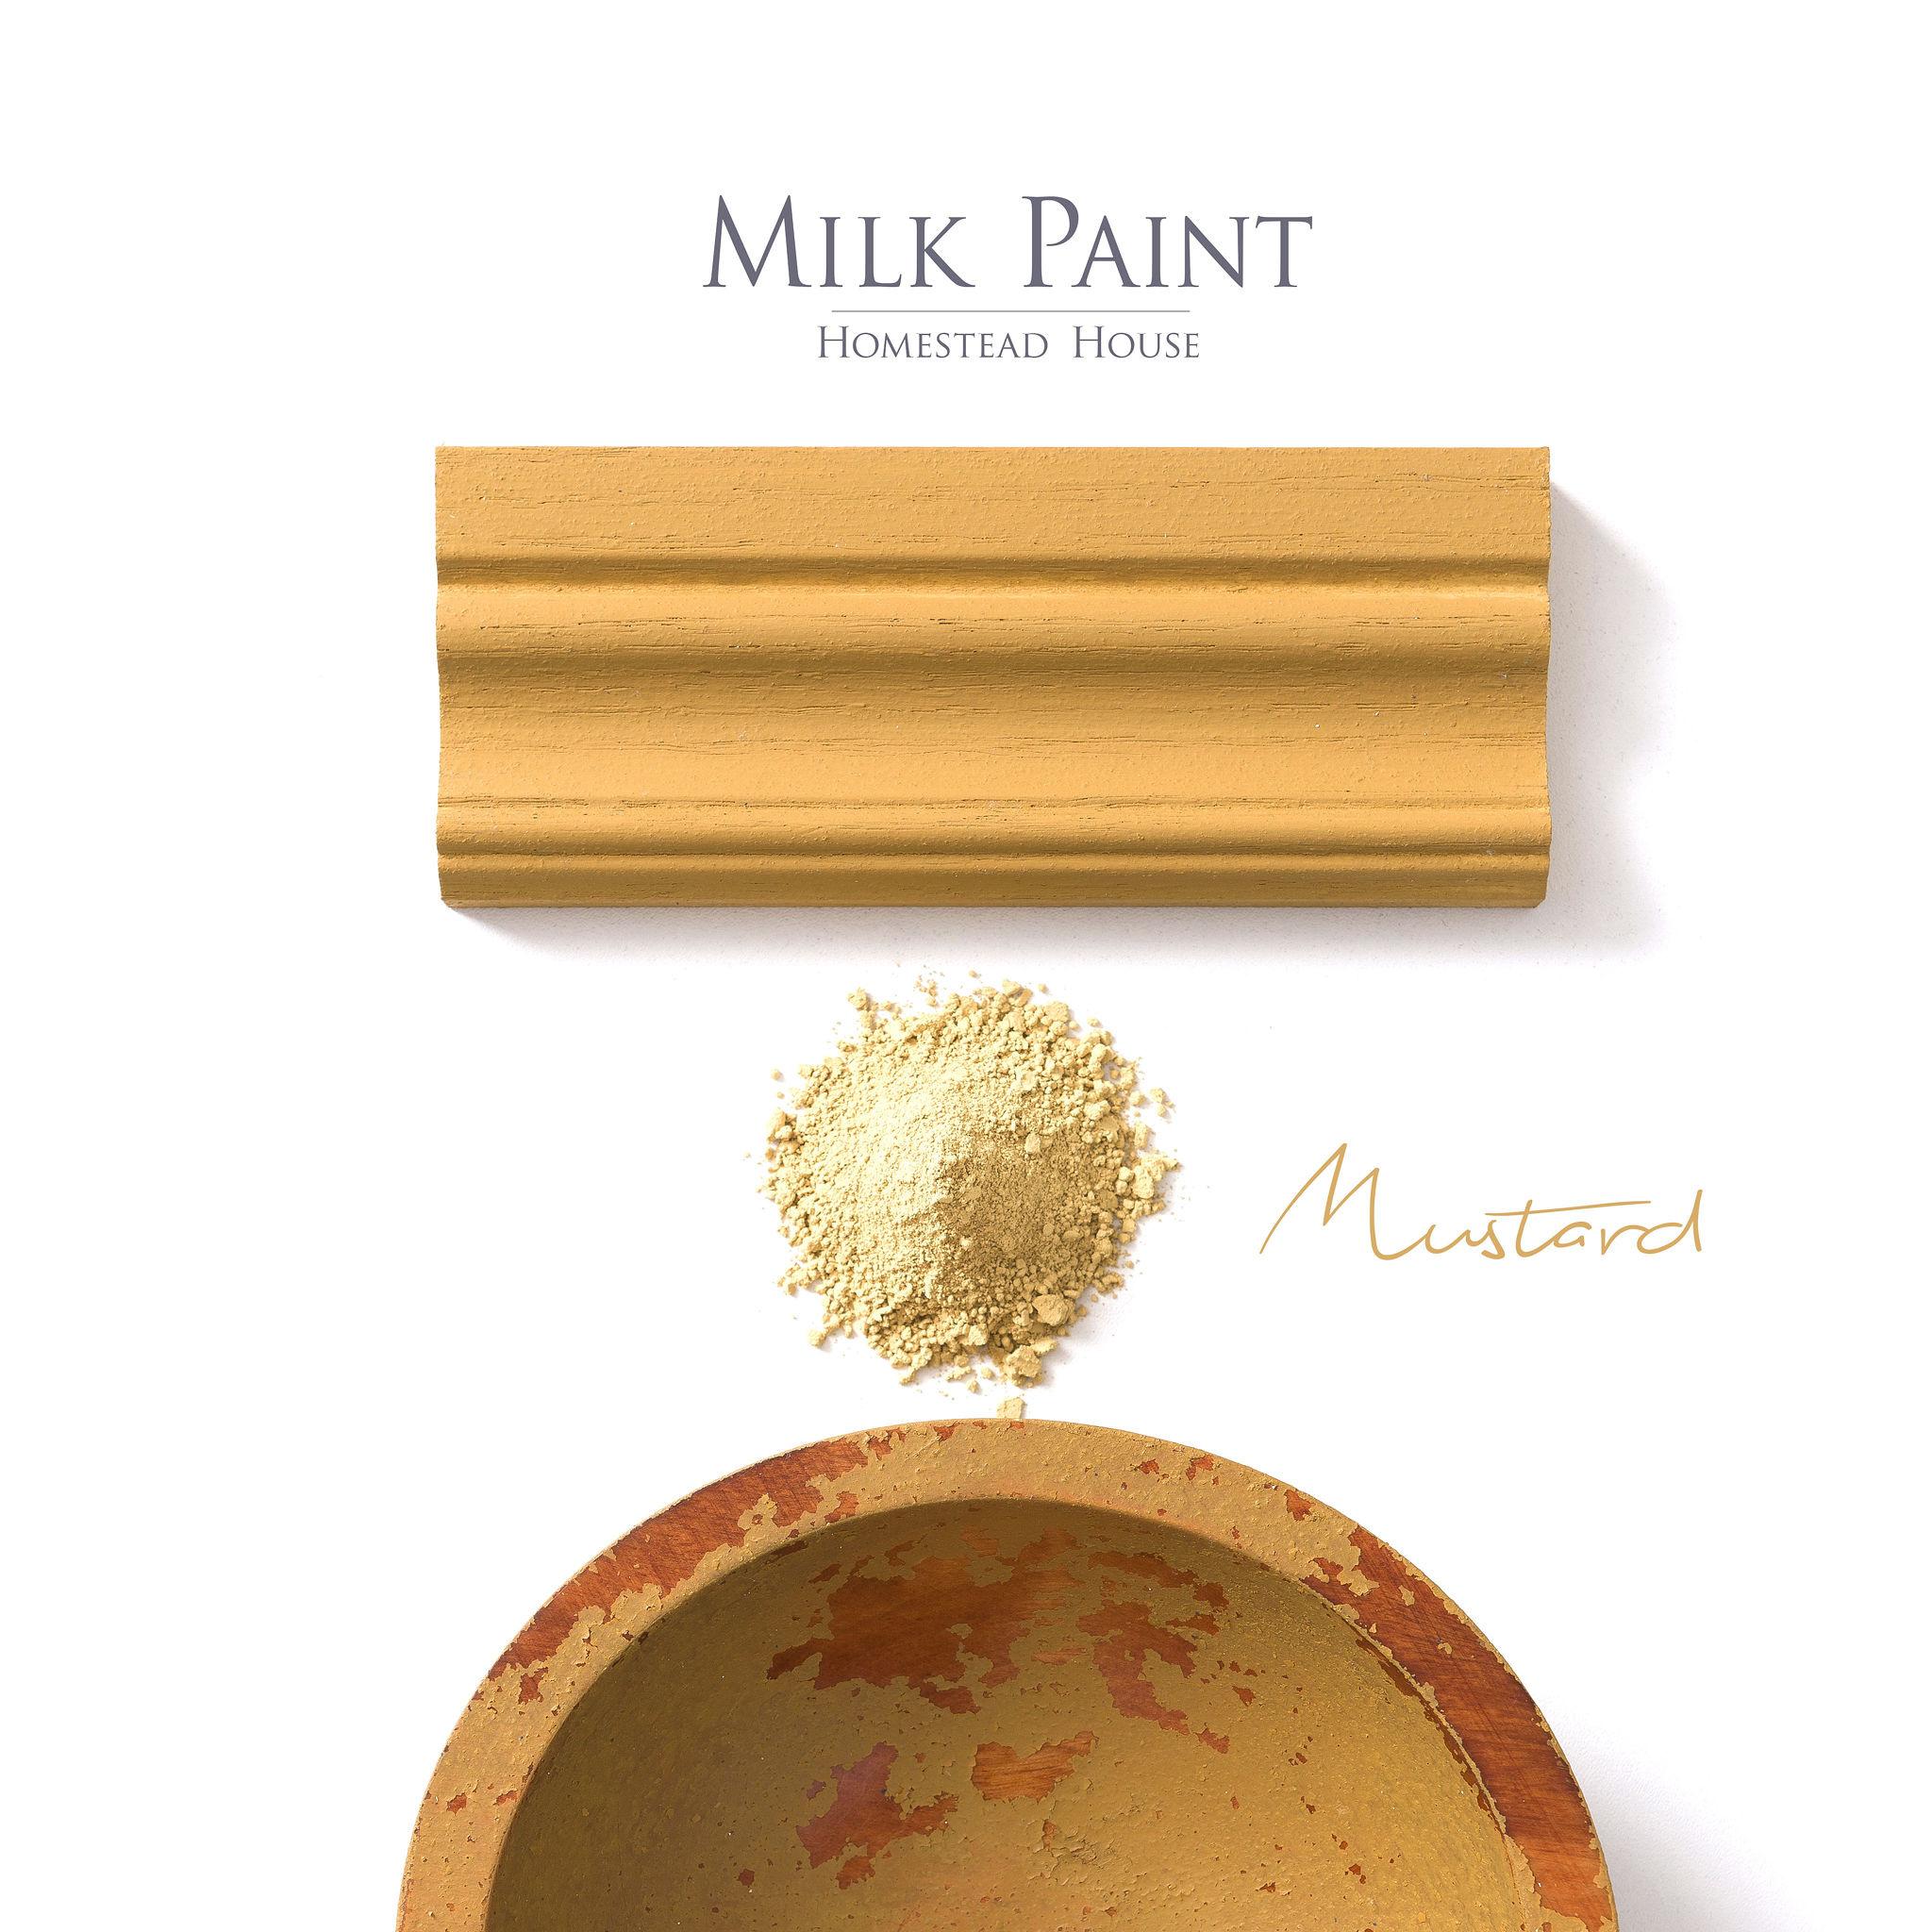 Homestead House HH - Milk Paint - Mustard - 230gr